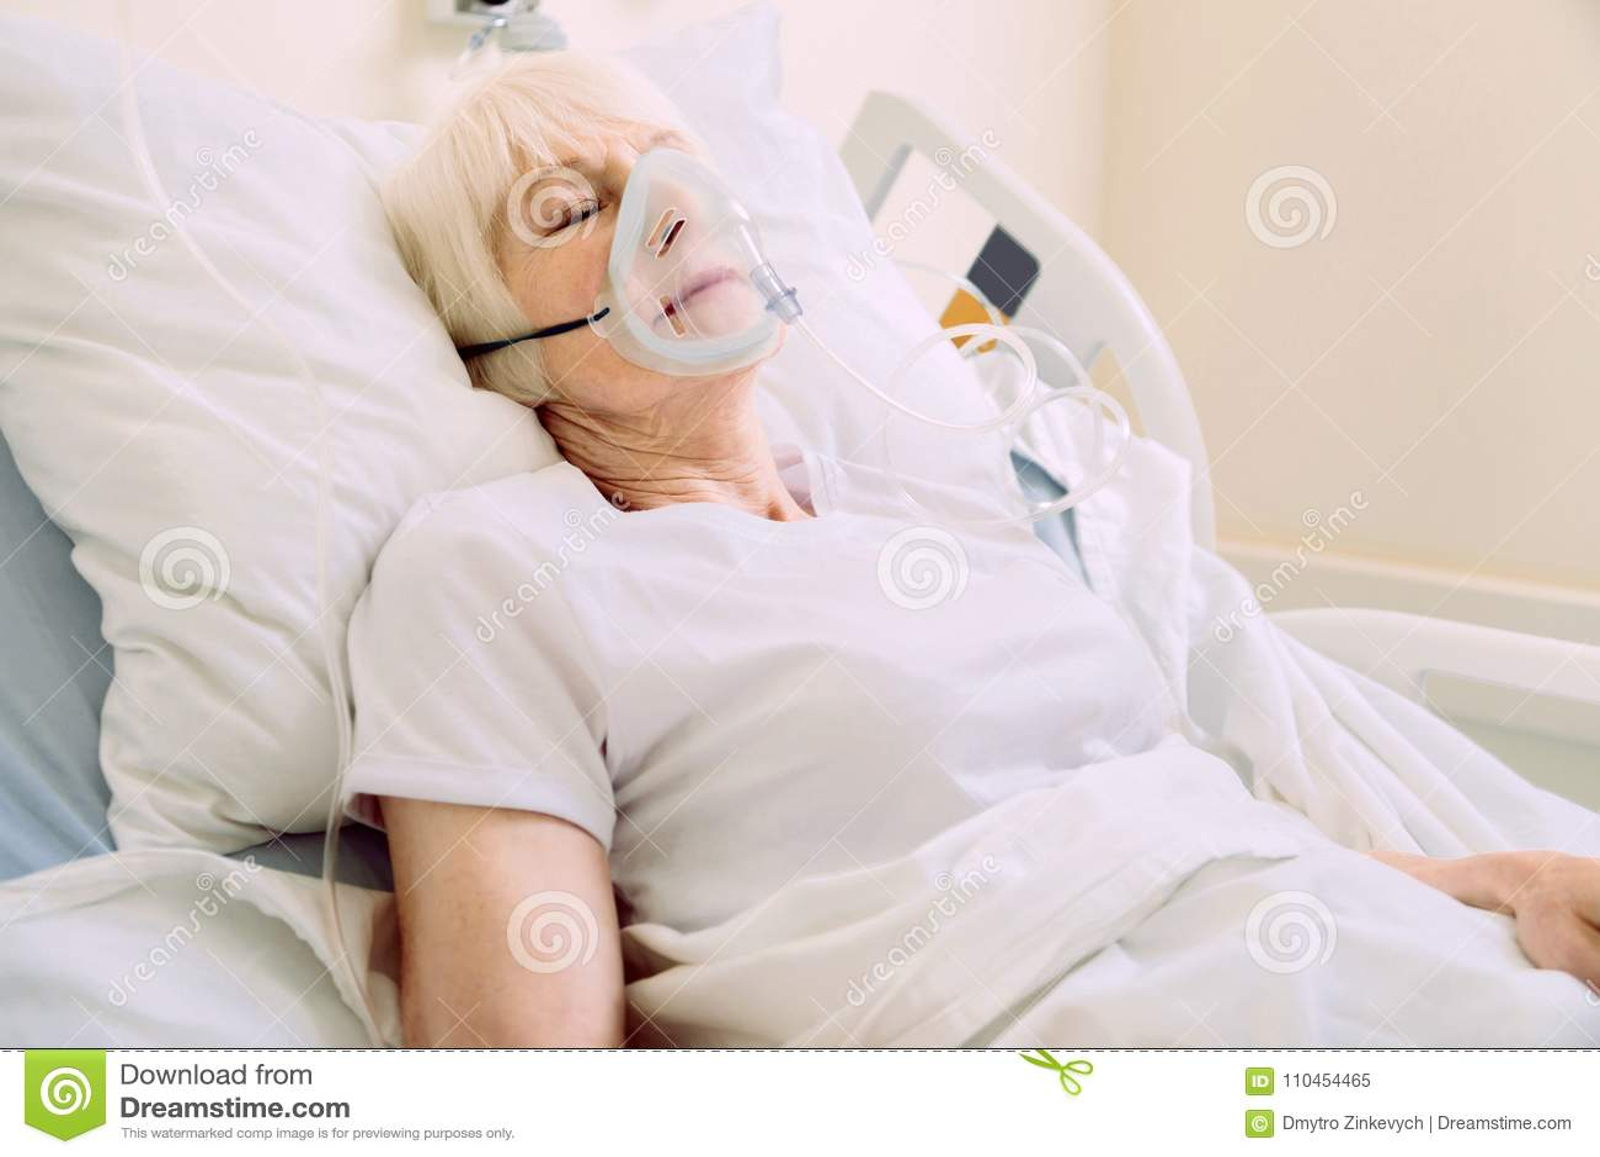 masque respiratoire hopital